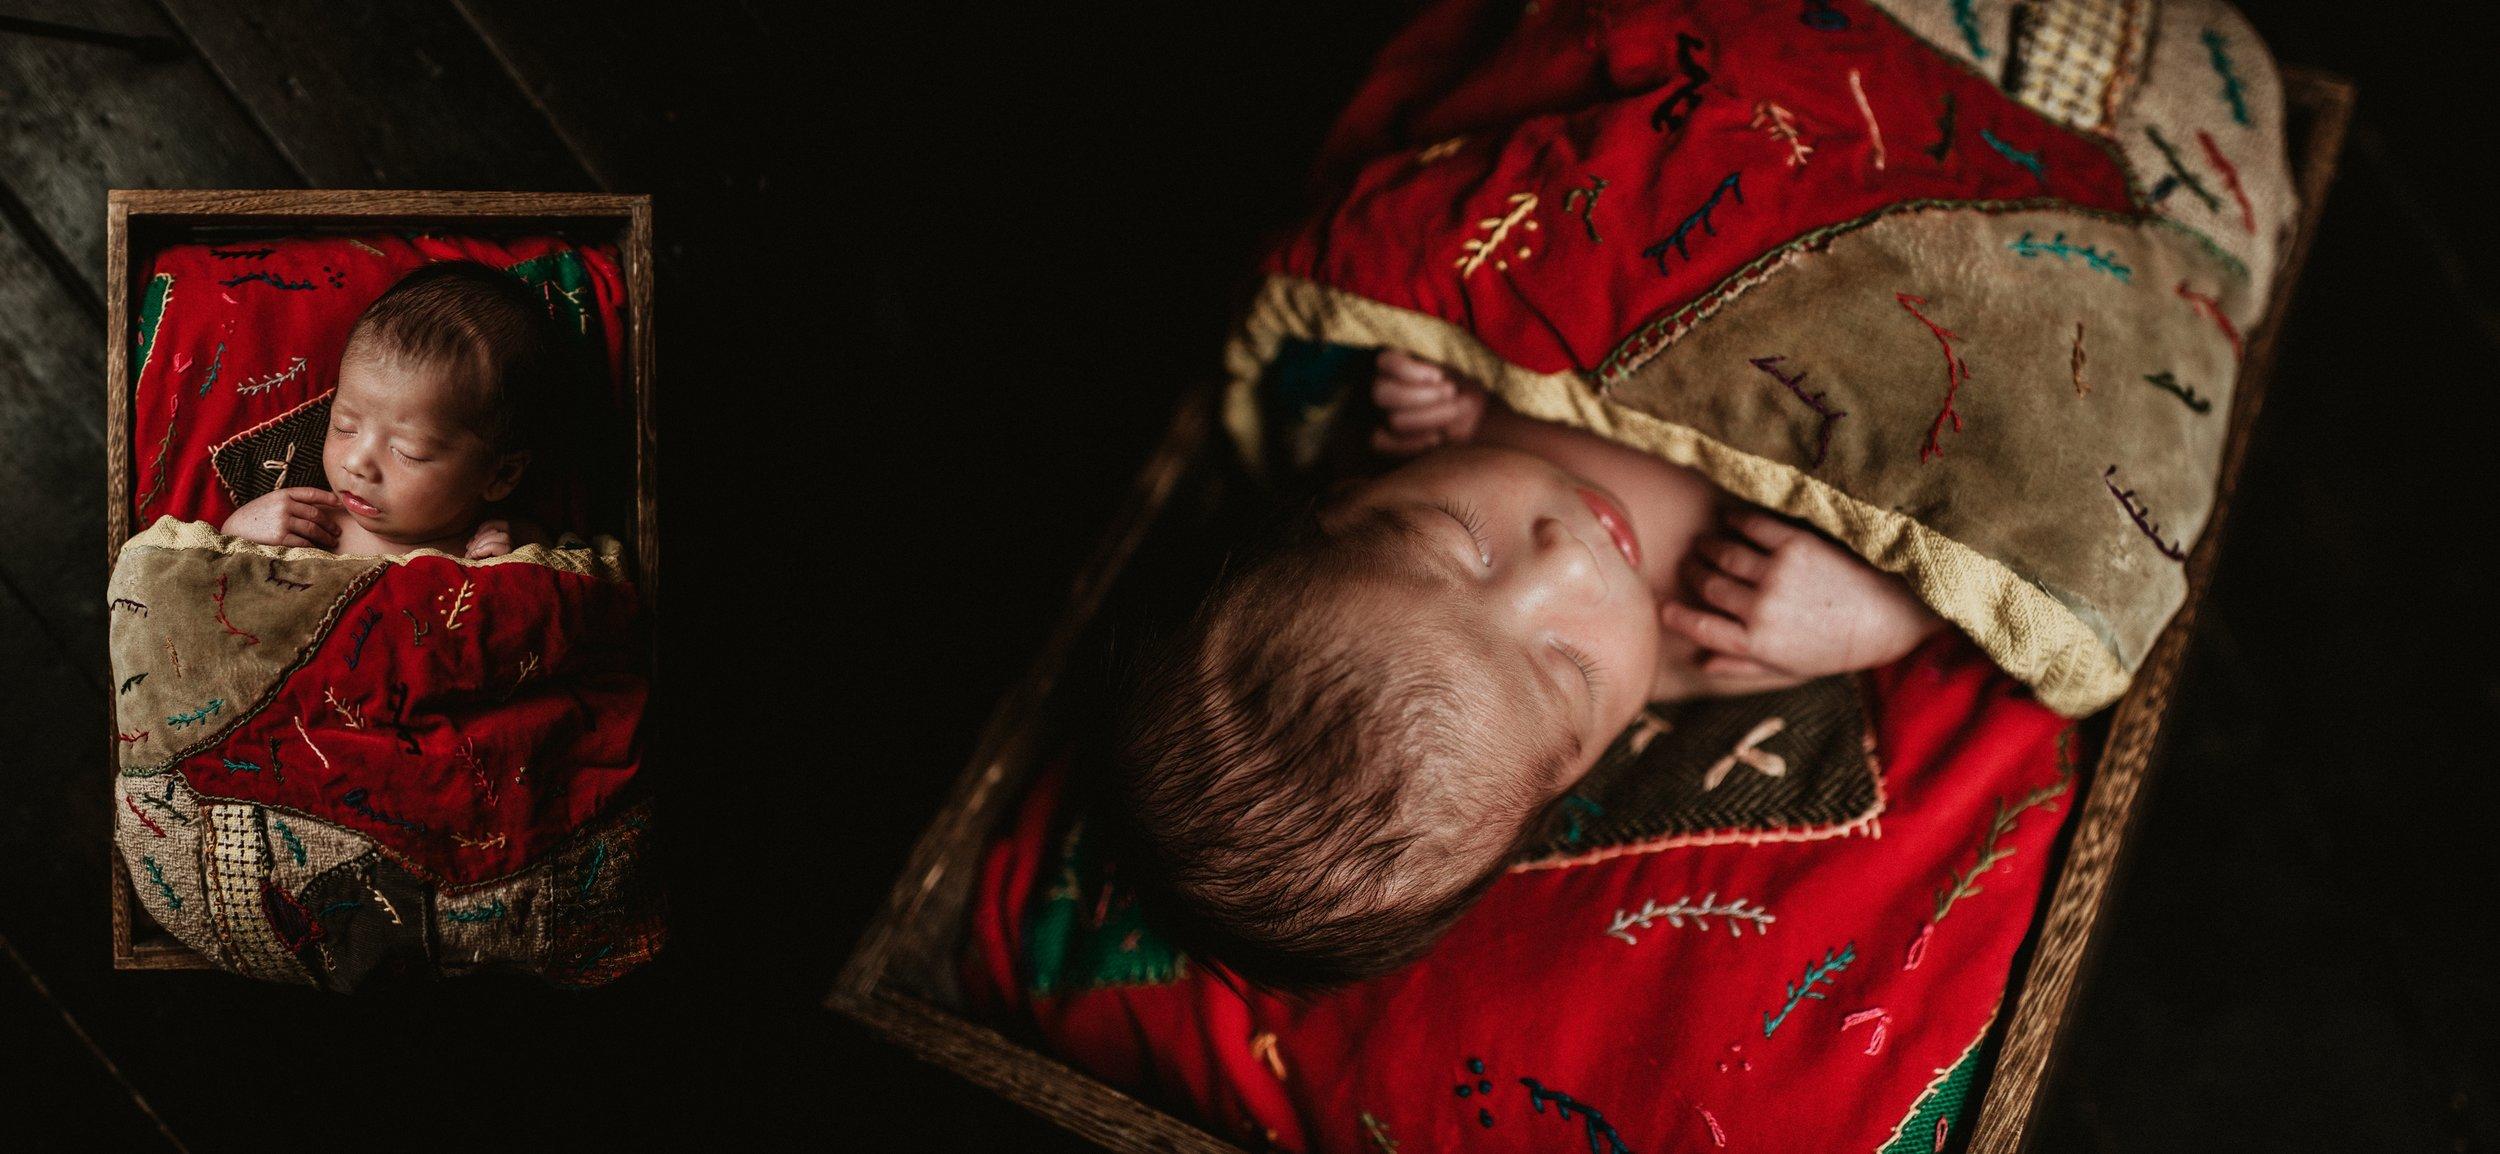 Rustic Newborn Photo Session | Farmhouse Newborn Studio Session | Vintage Baby Boy Session | Terry Farms Photography